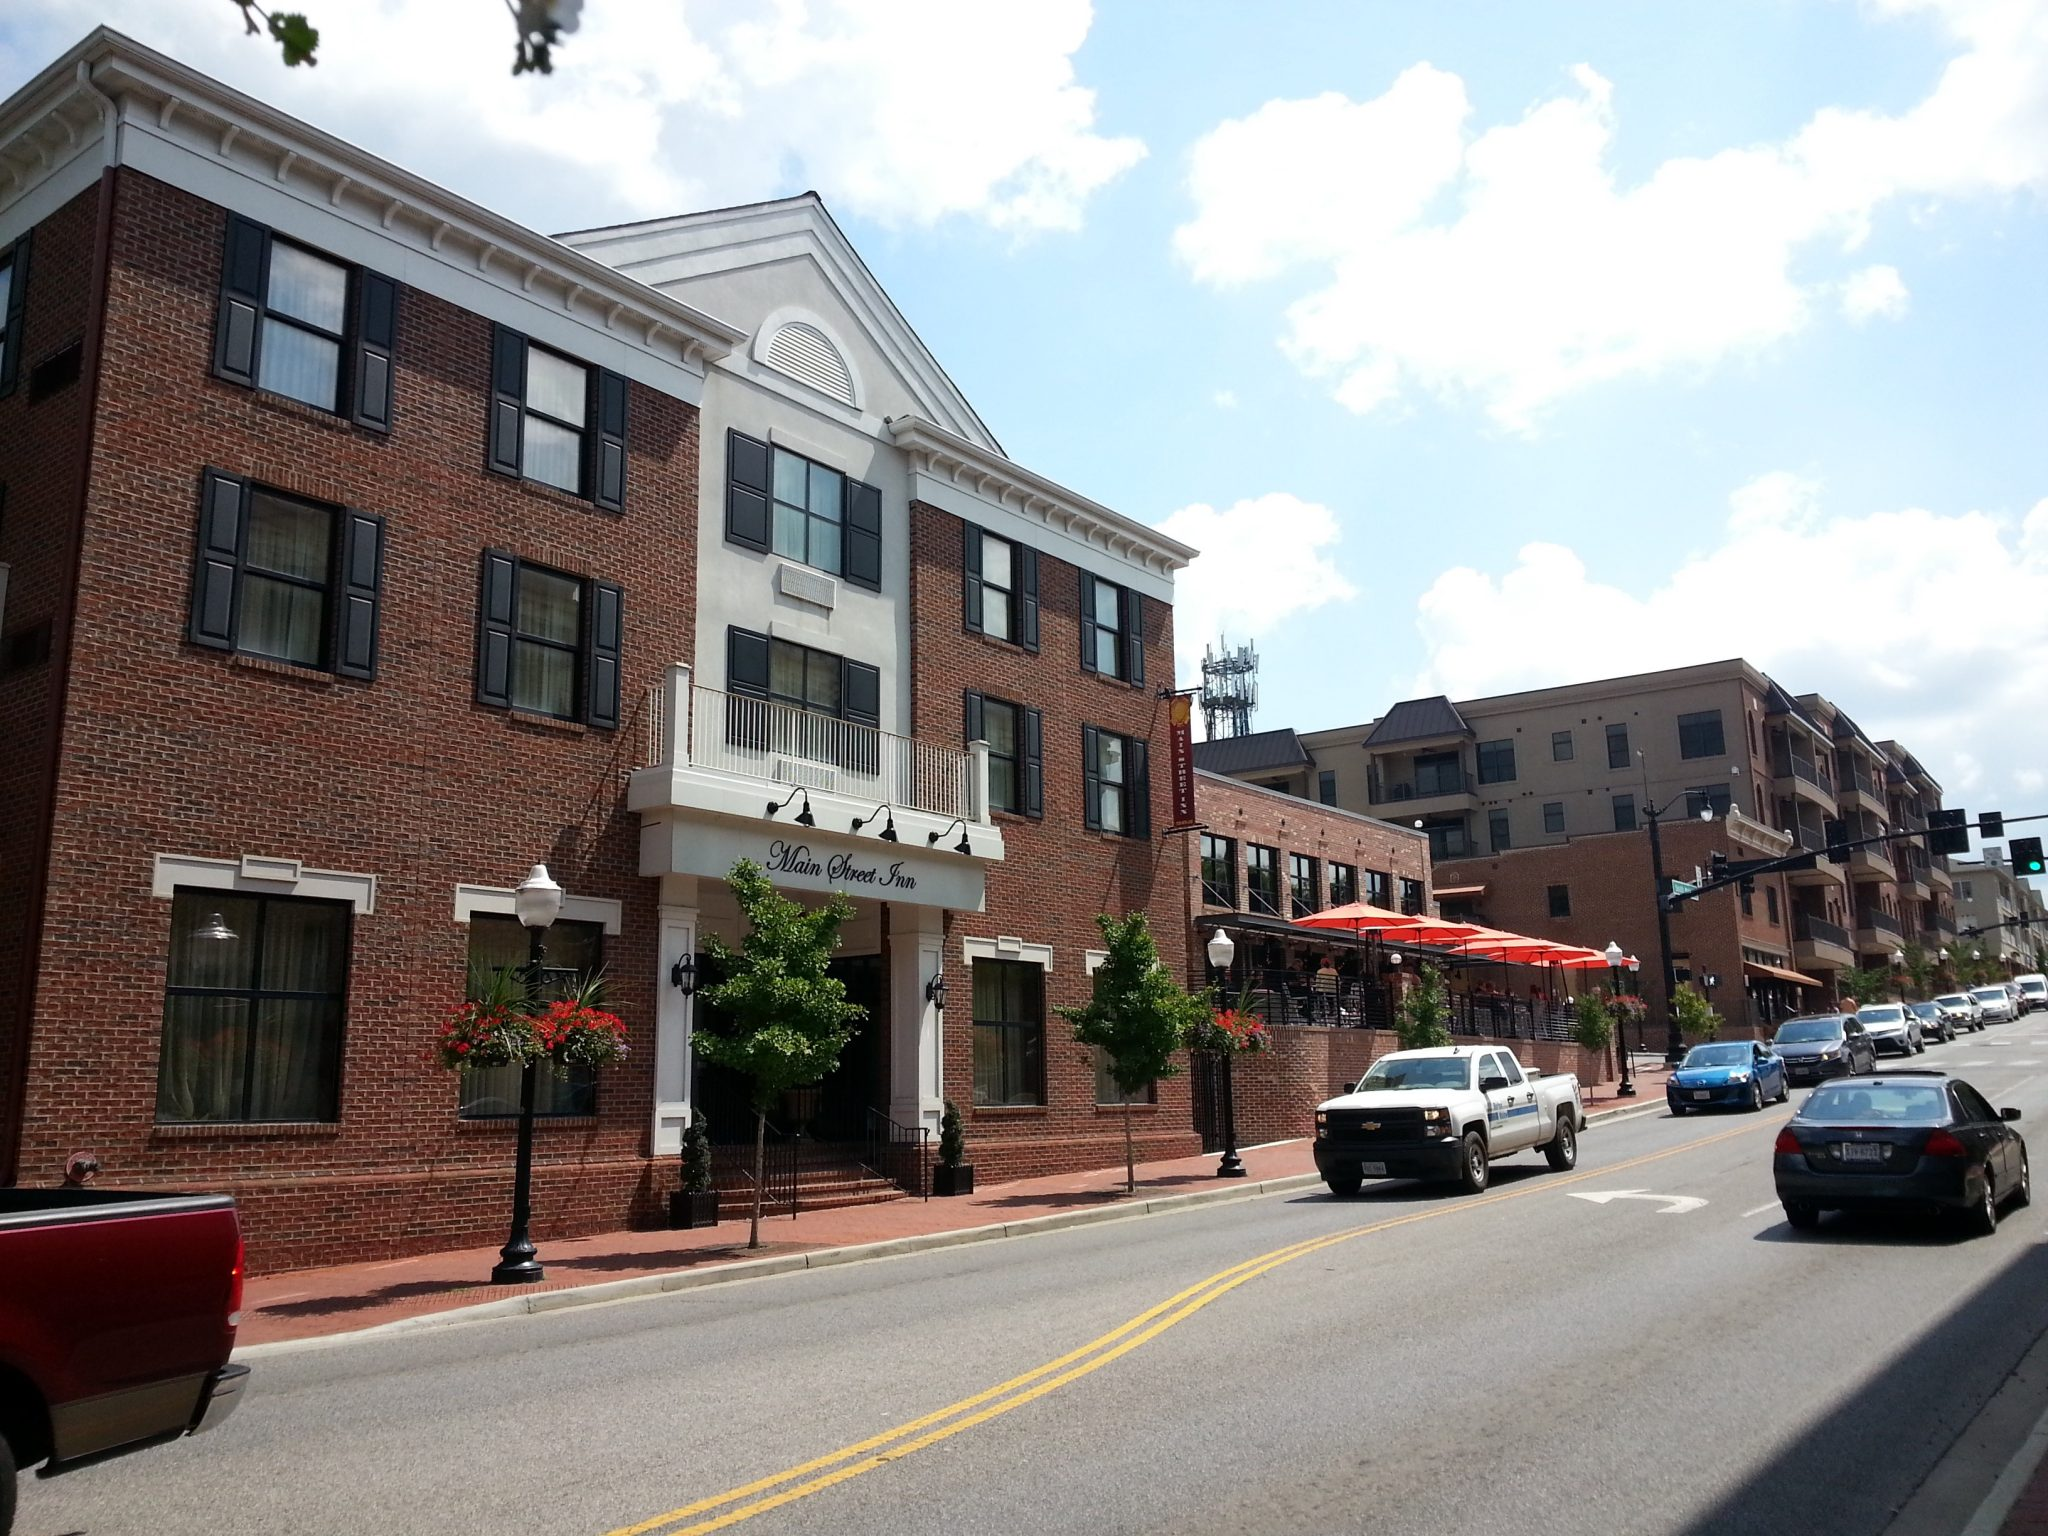 Downtown Blacksburg Virginia 39 S New River Valley